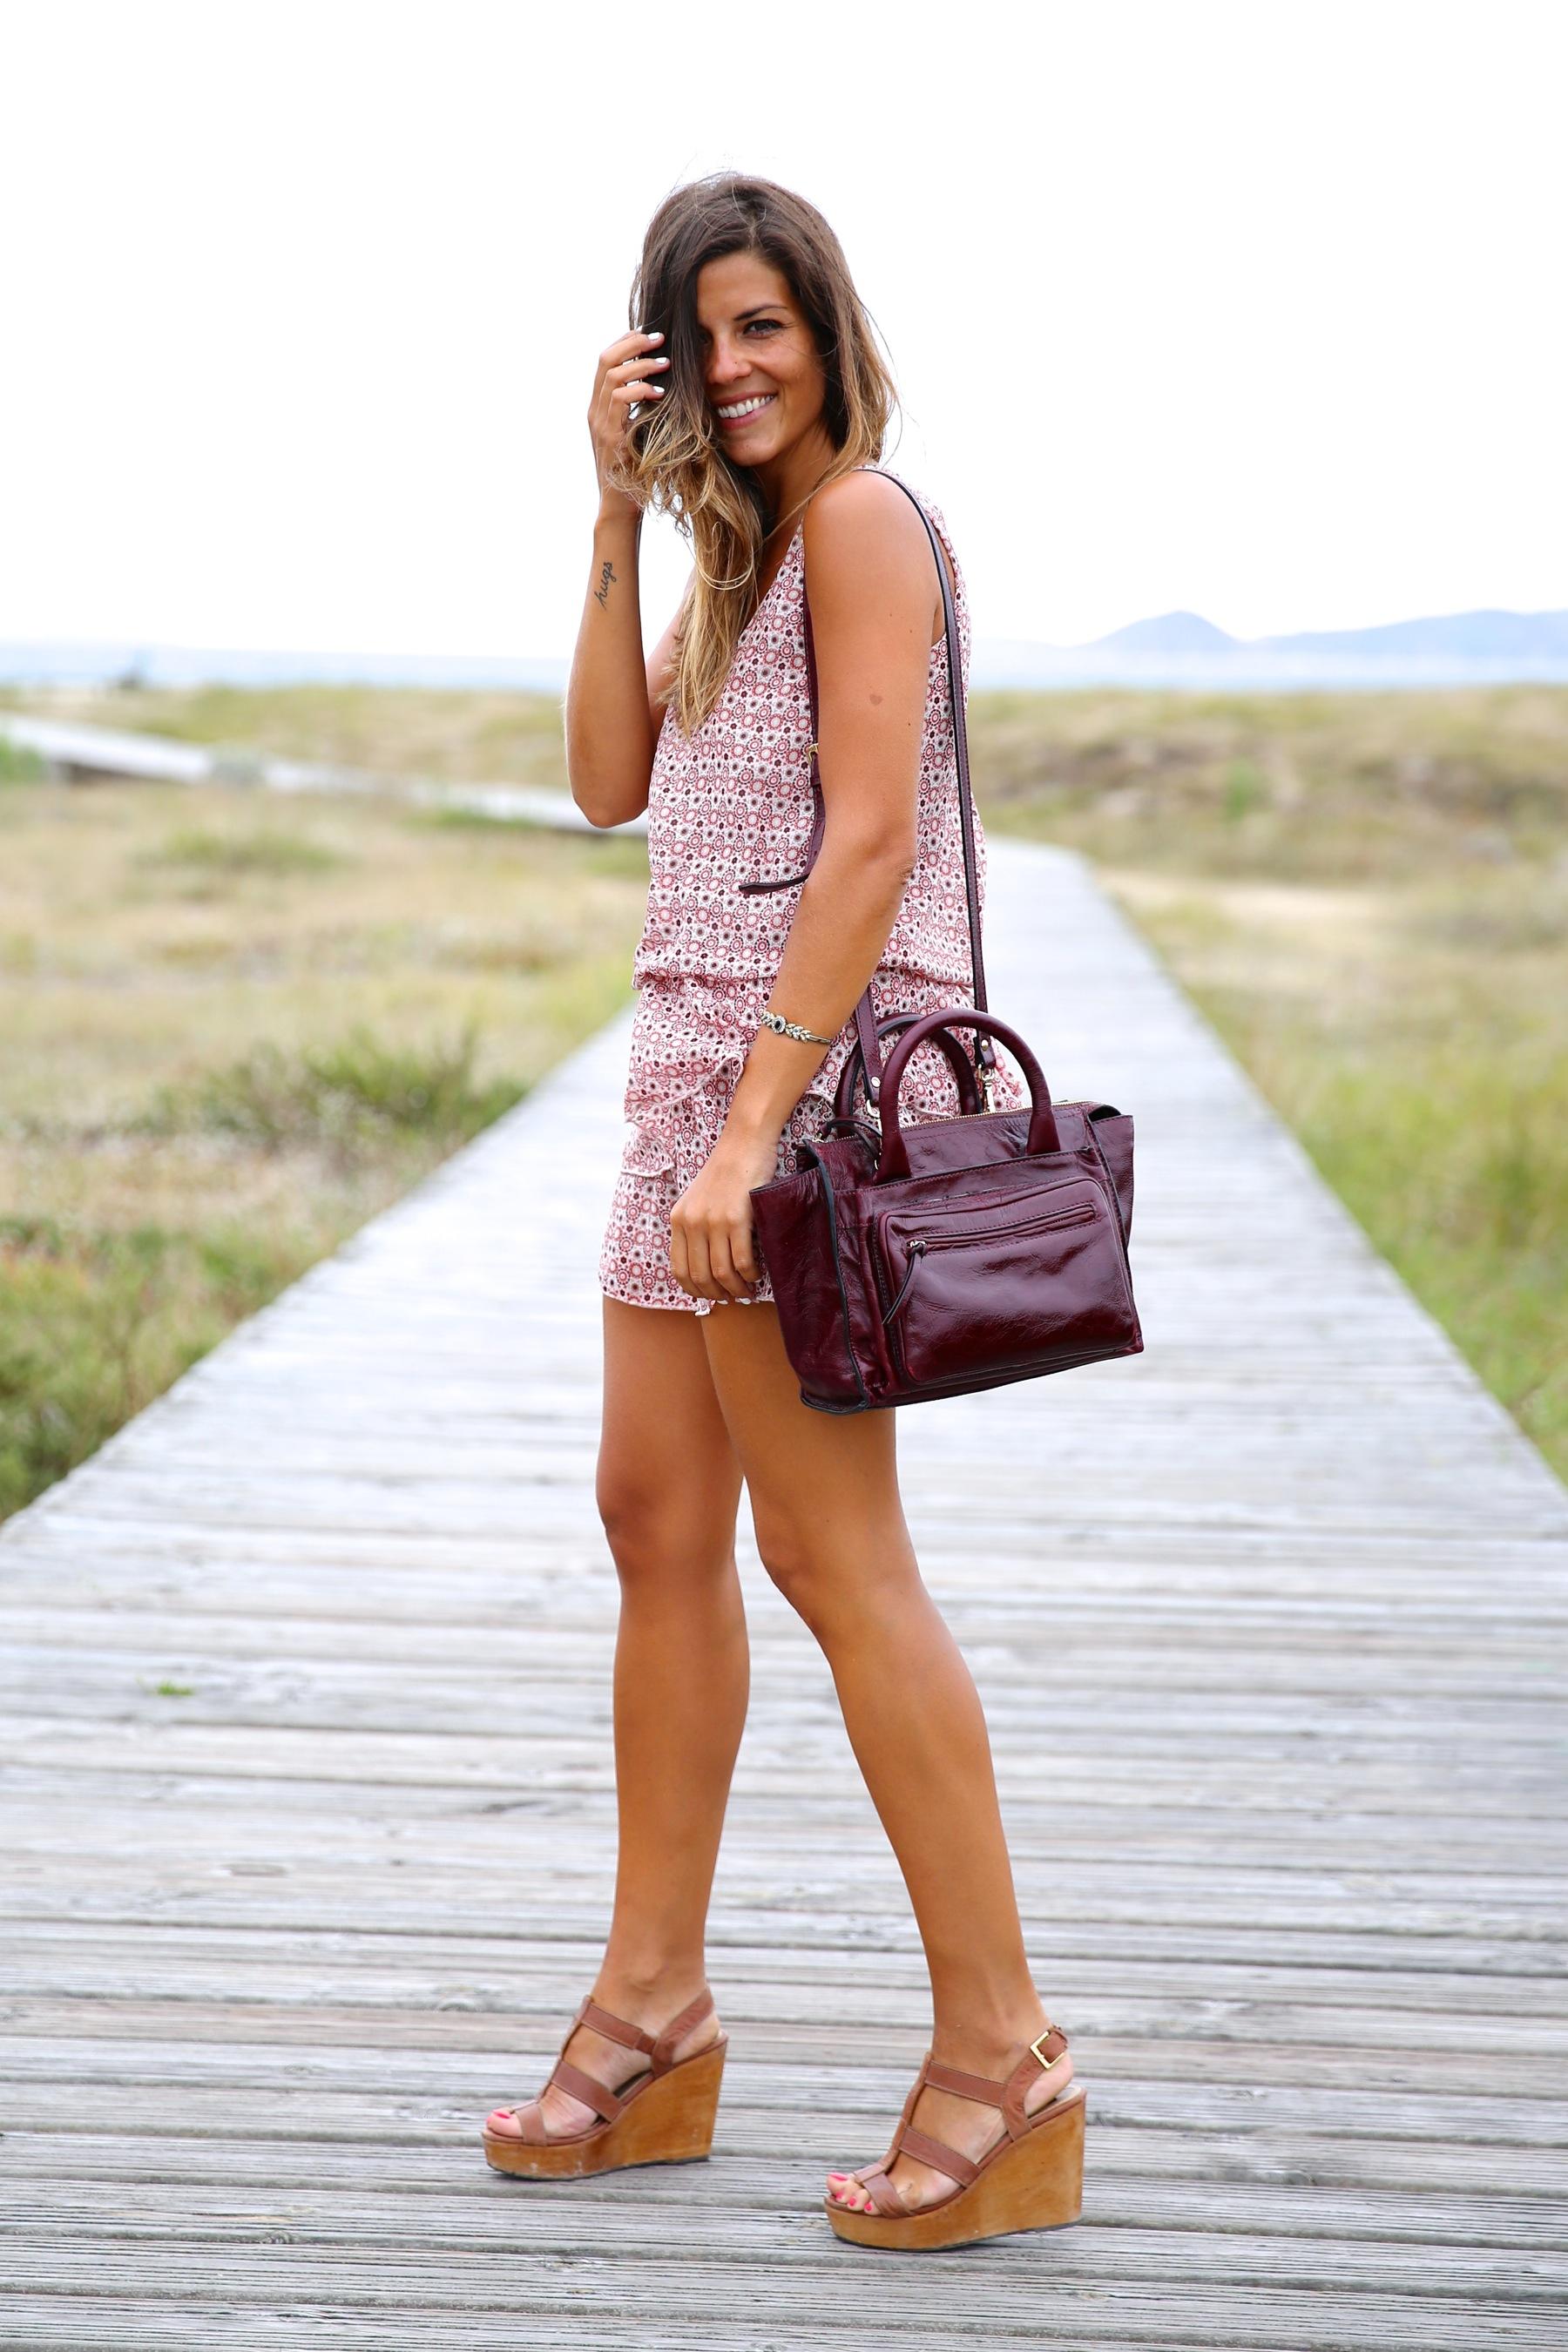 trendy_taste-look-outfit-street_style-ootd-blog-blogger-fashion_spain-moda_españa-boho-beach-playa-galicia-vestido-dress-sandalias-sandals-13